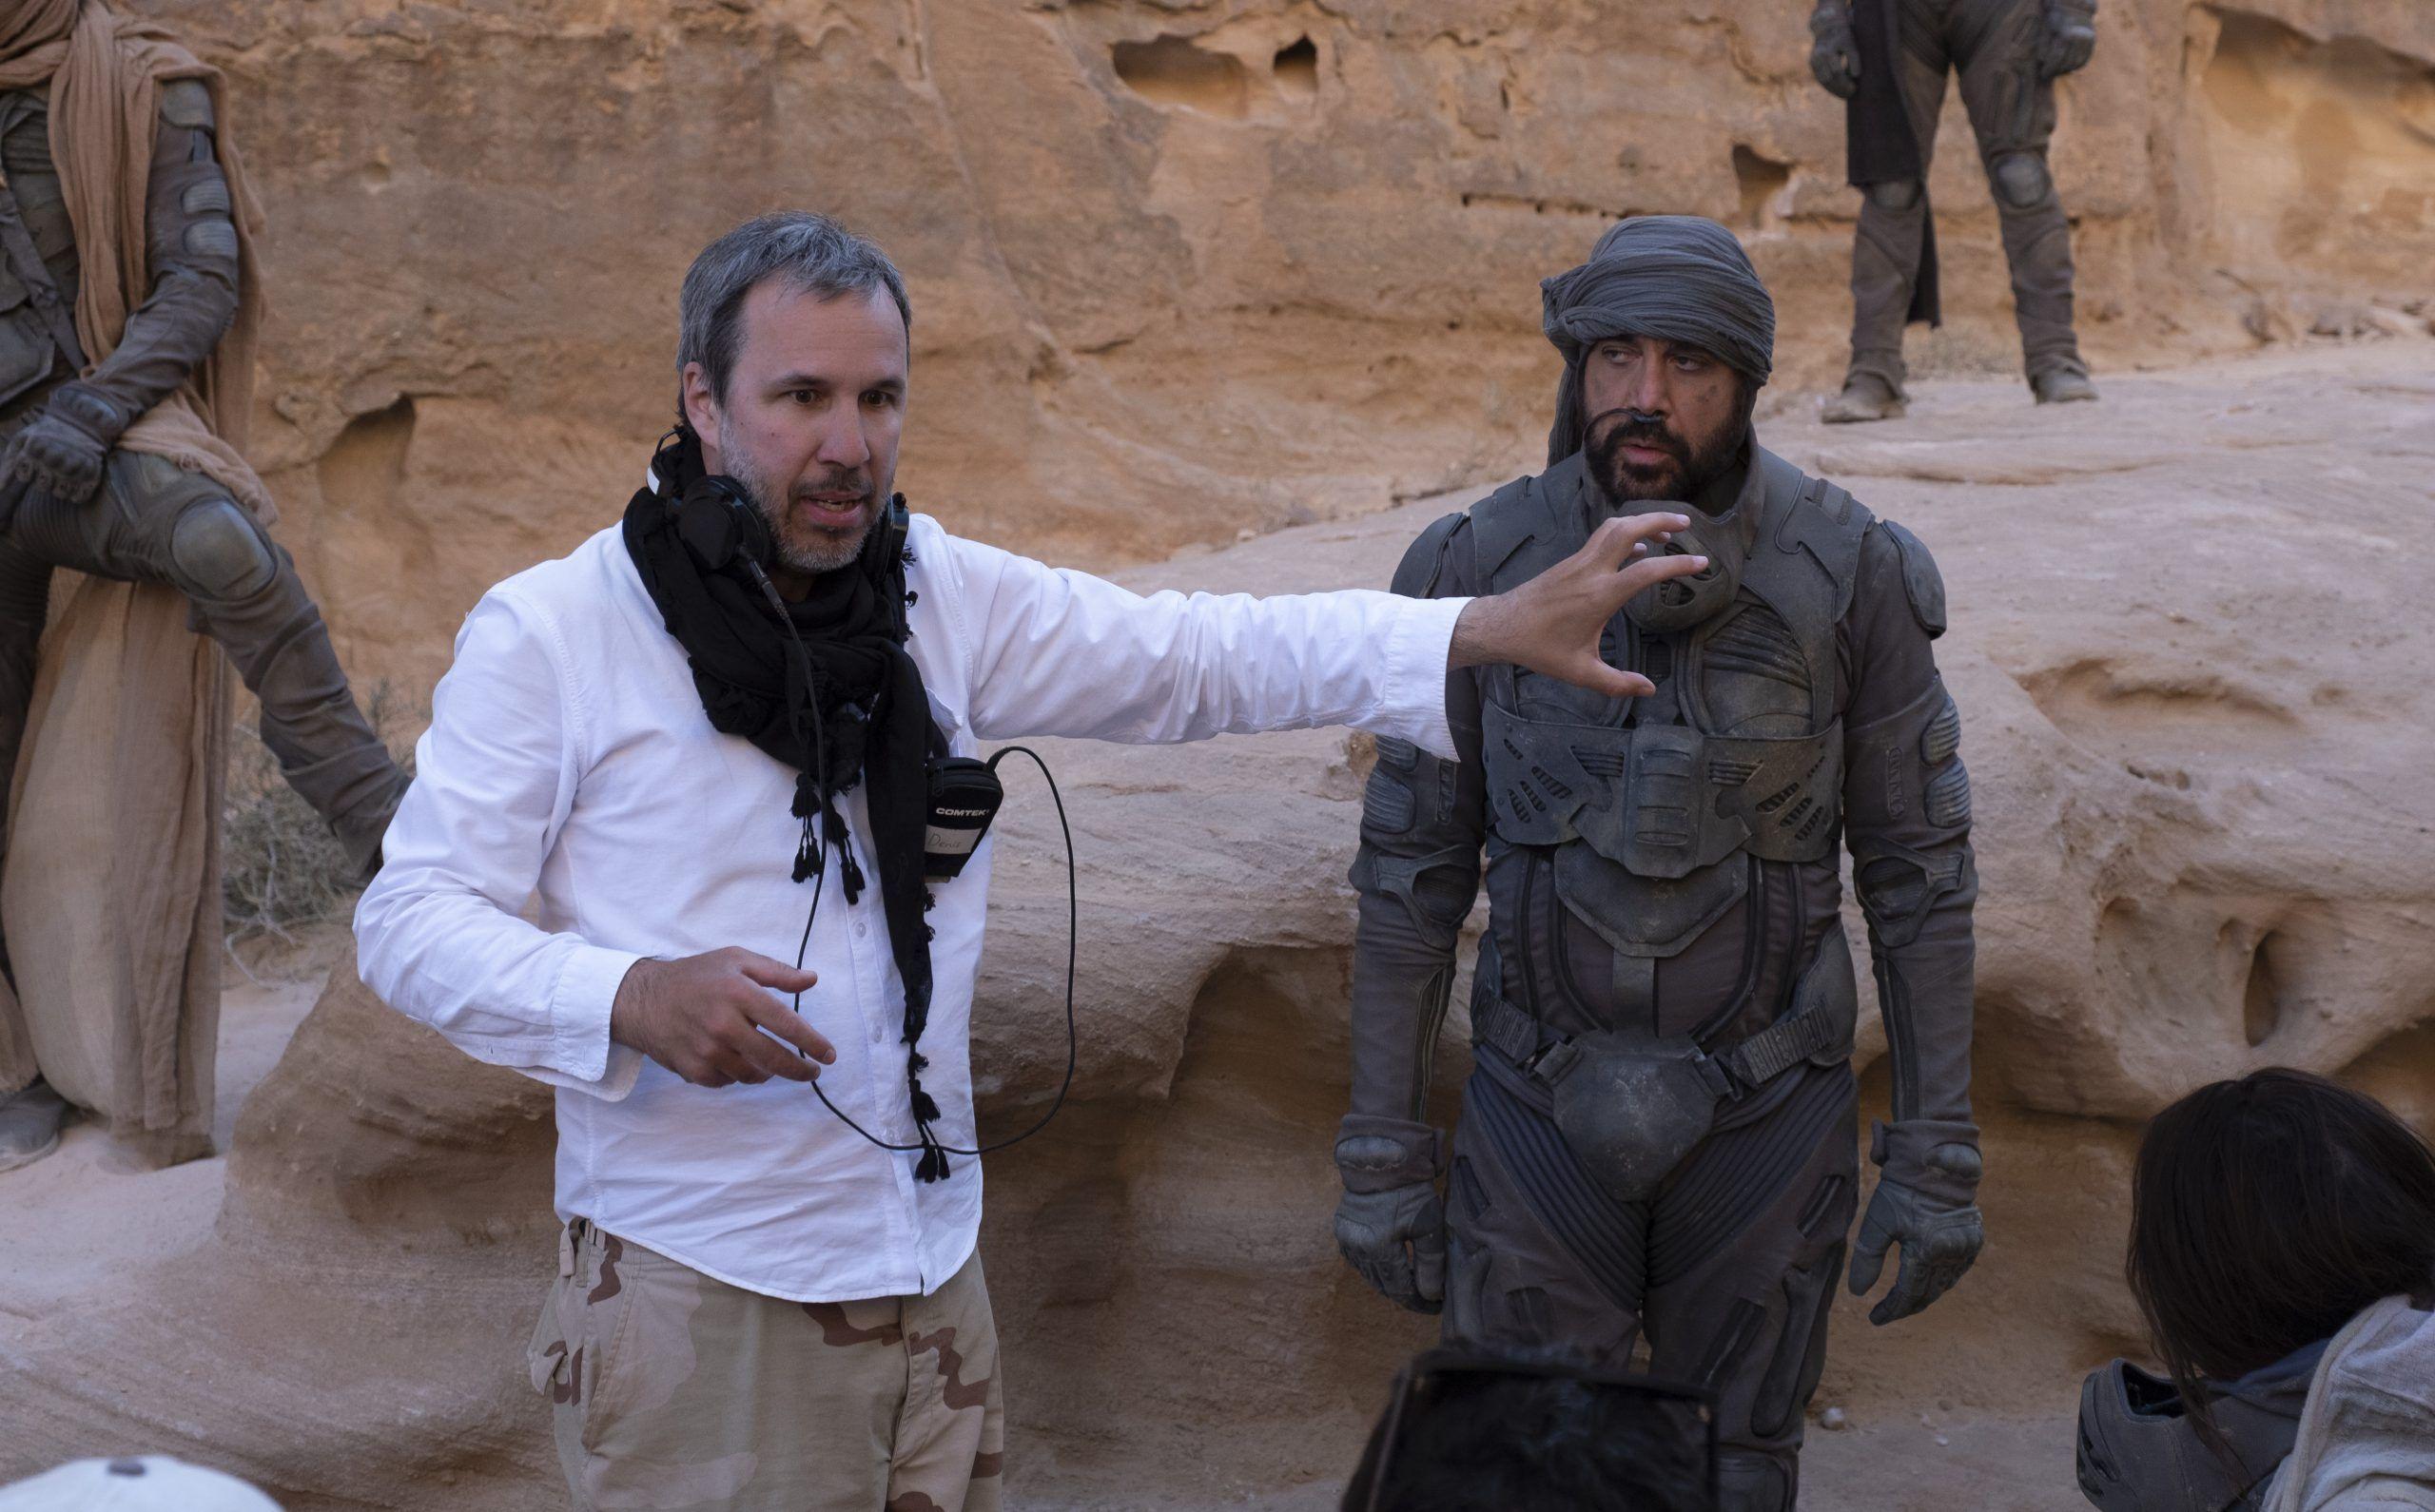 Dune Director Denis Villeneuve on Reshoots and Pandemic Impact ...